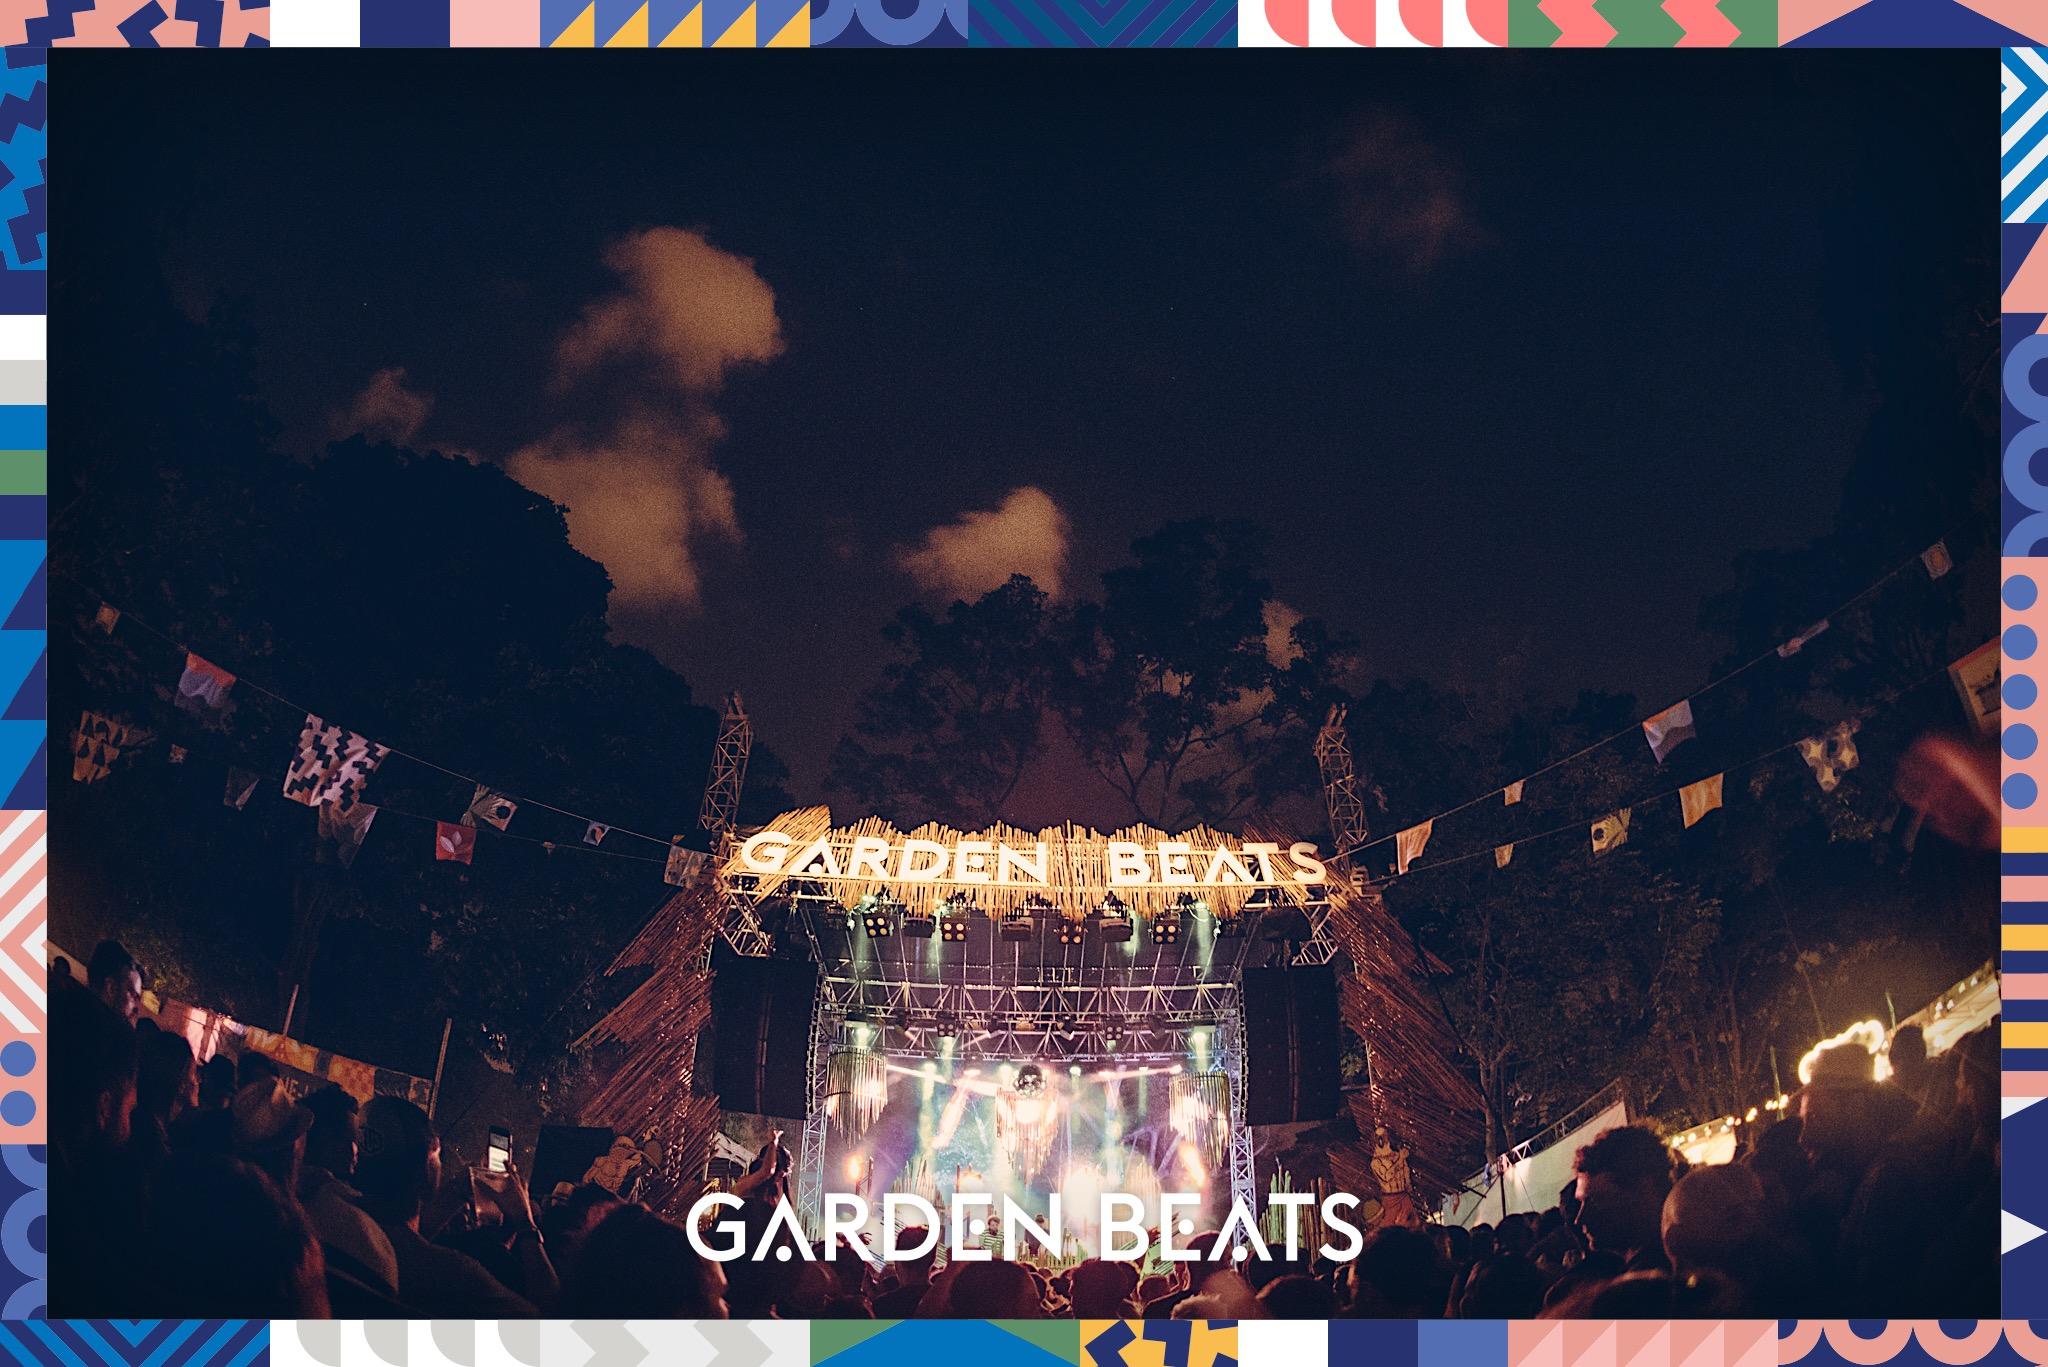 18032017_GardenBeats_Colossal883_WatermarkedGB.jpg